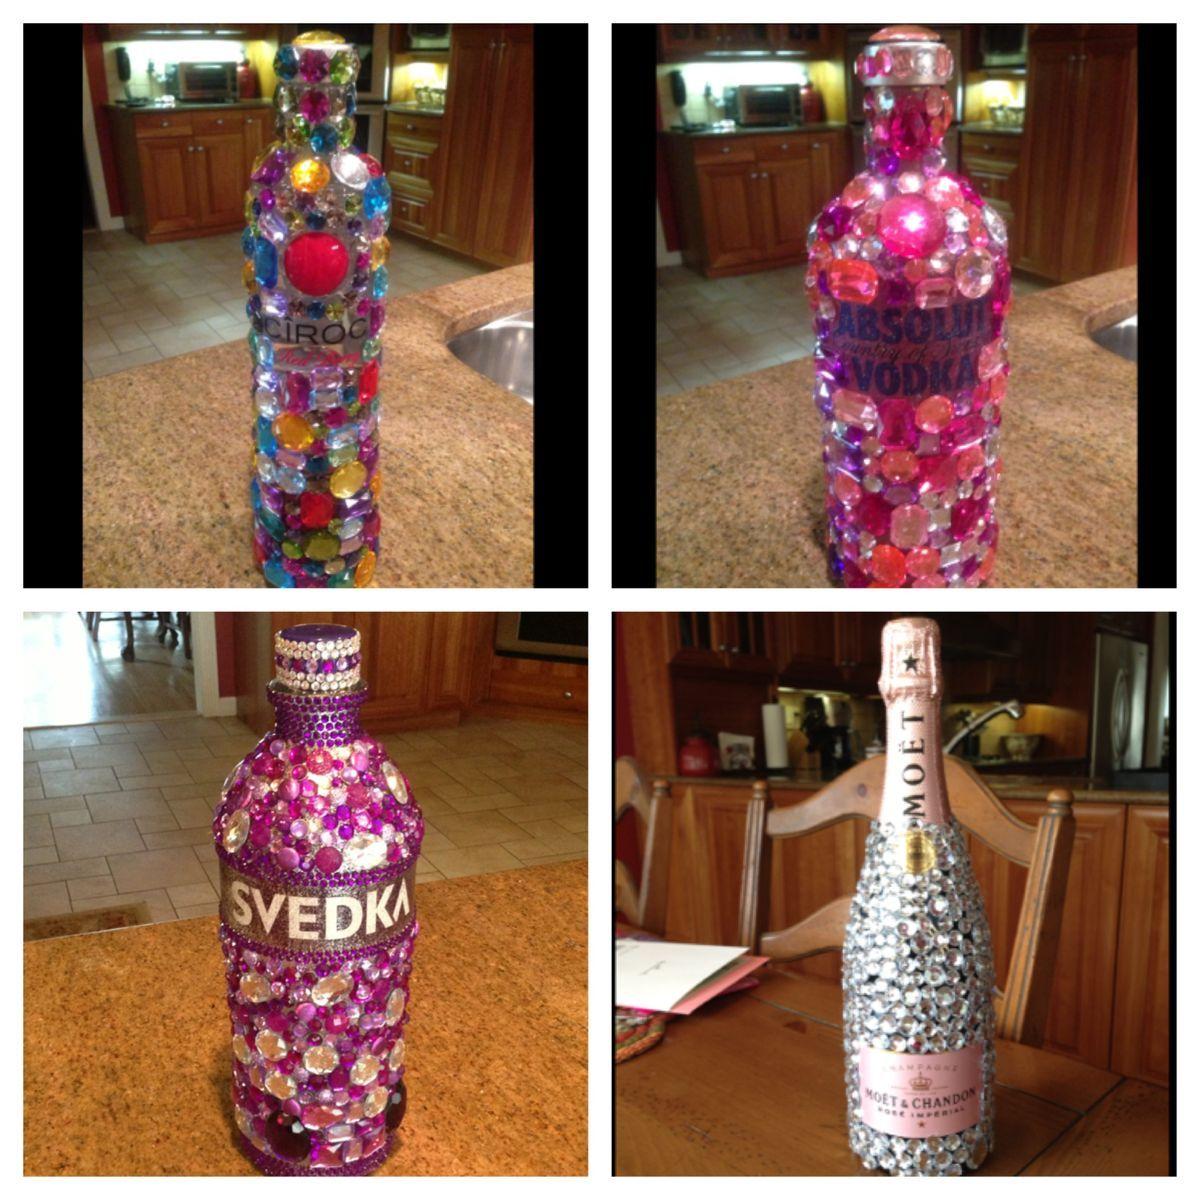 21st Birthday Decorations Bday Ideas Gifts Bash Girl